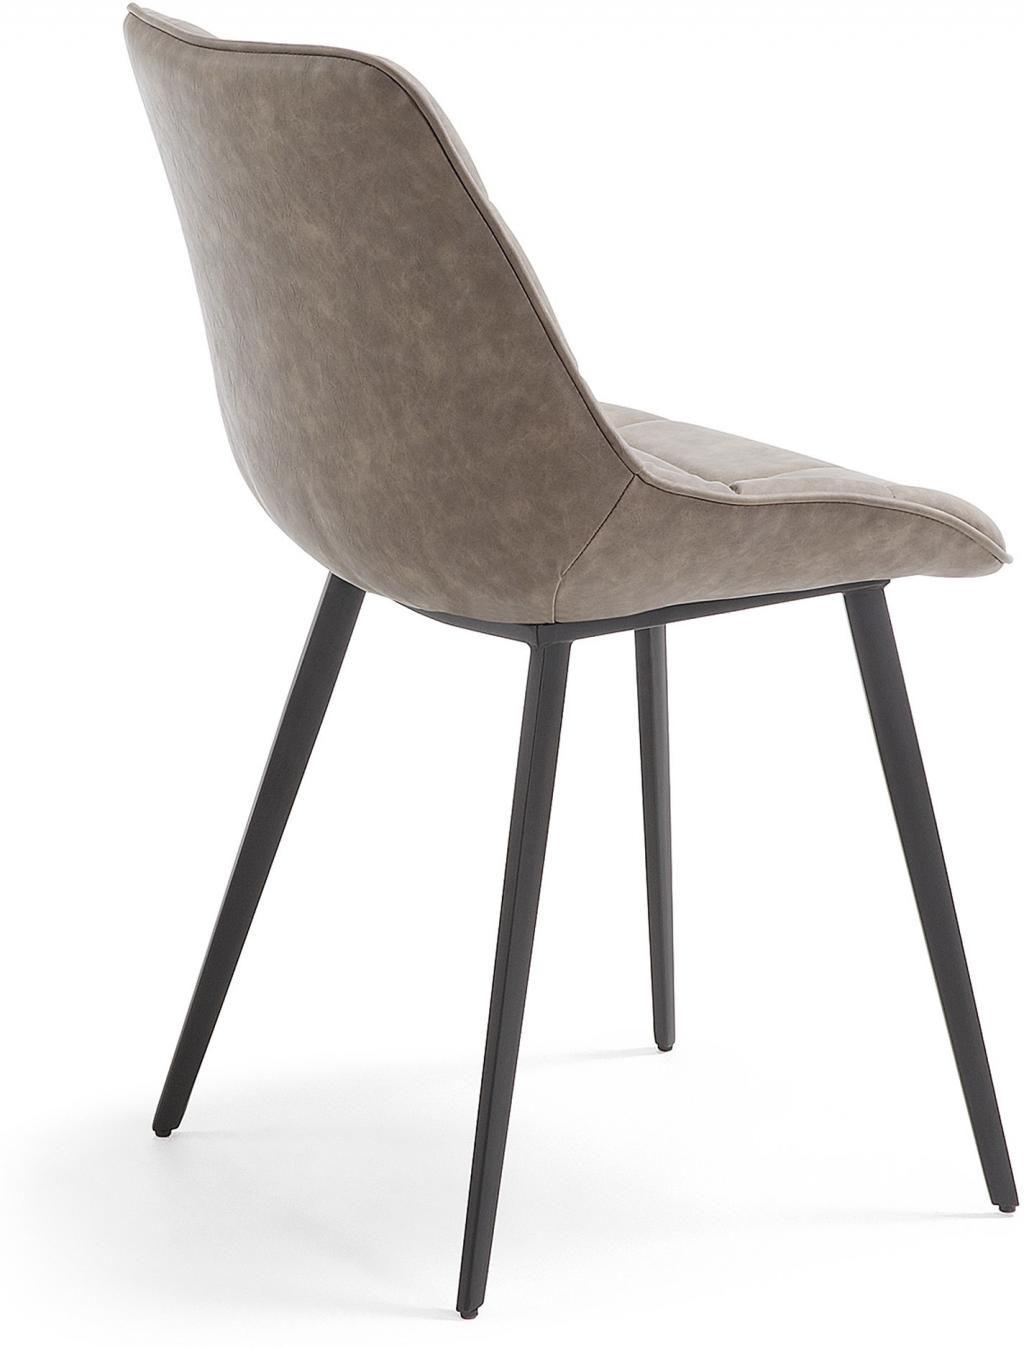 stuhl adah dunkelbraun pu leder metall la forma kaufen wohn und. Black Bedroom Furniture Sets. Home Design Ideas